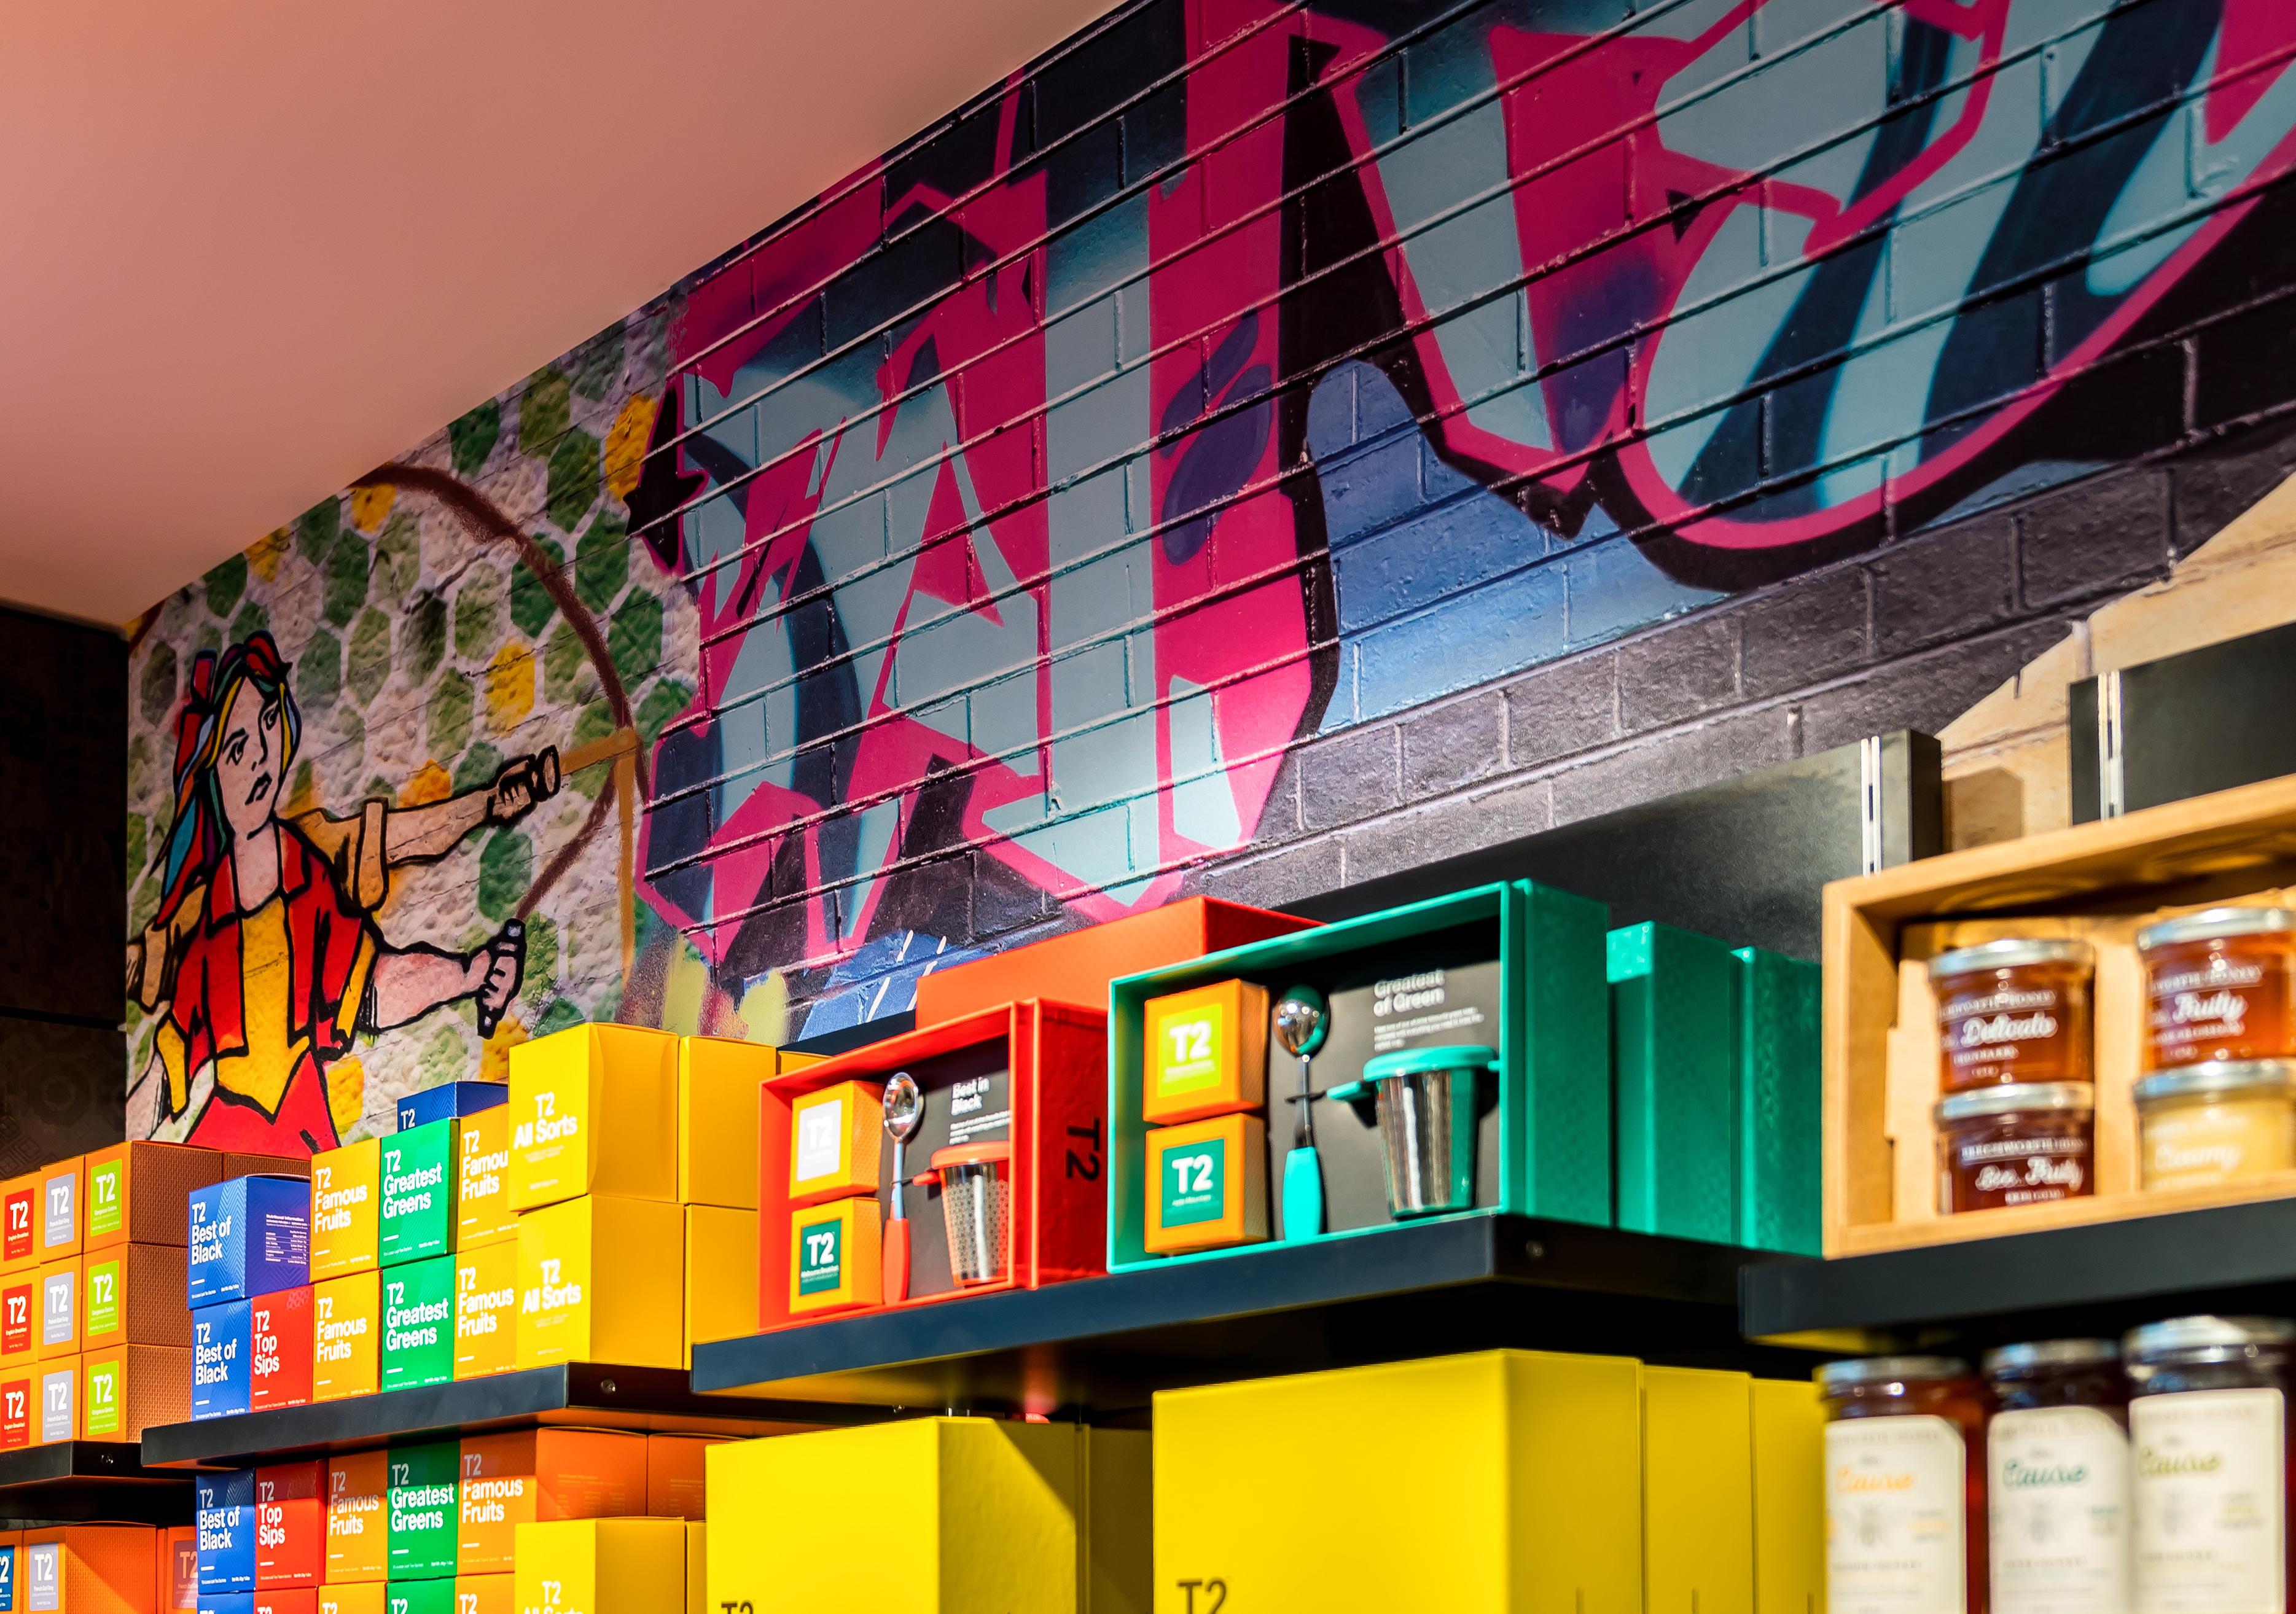 The Melbourne Store